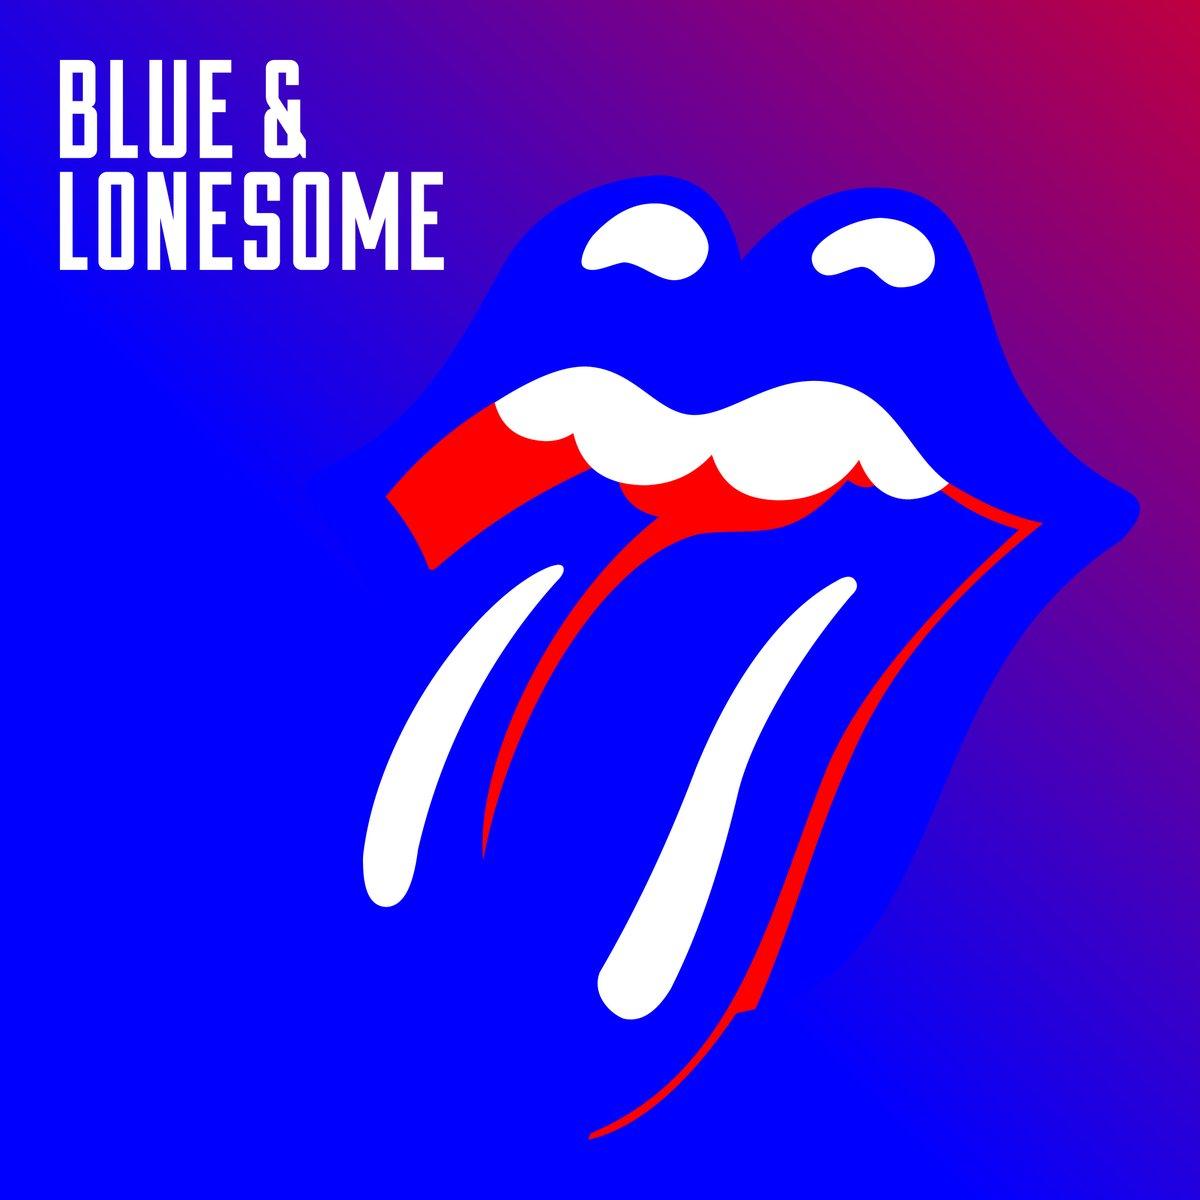 https://www.musikexpress.de/wp-content/uploads/2016/12/01/12/therollingstones-blue.jpg